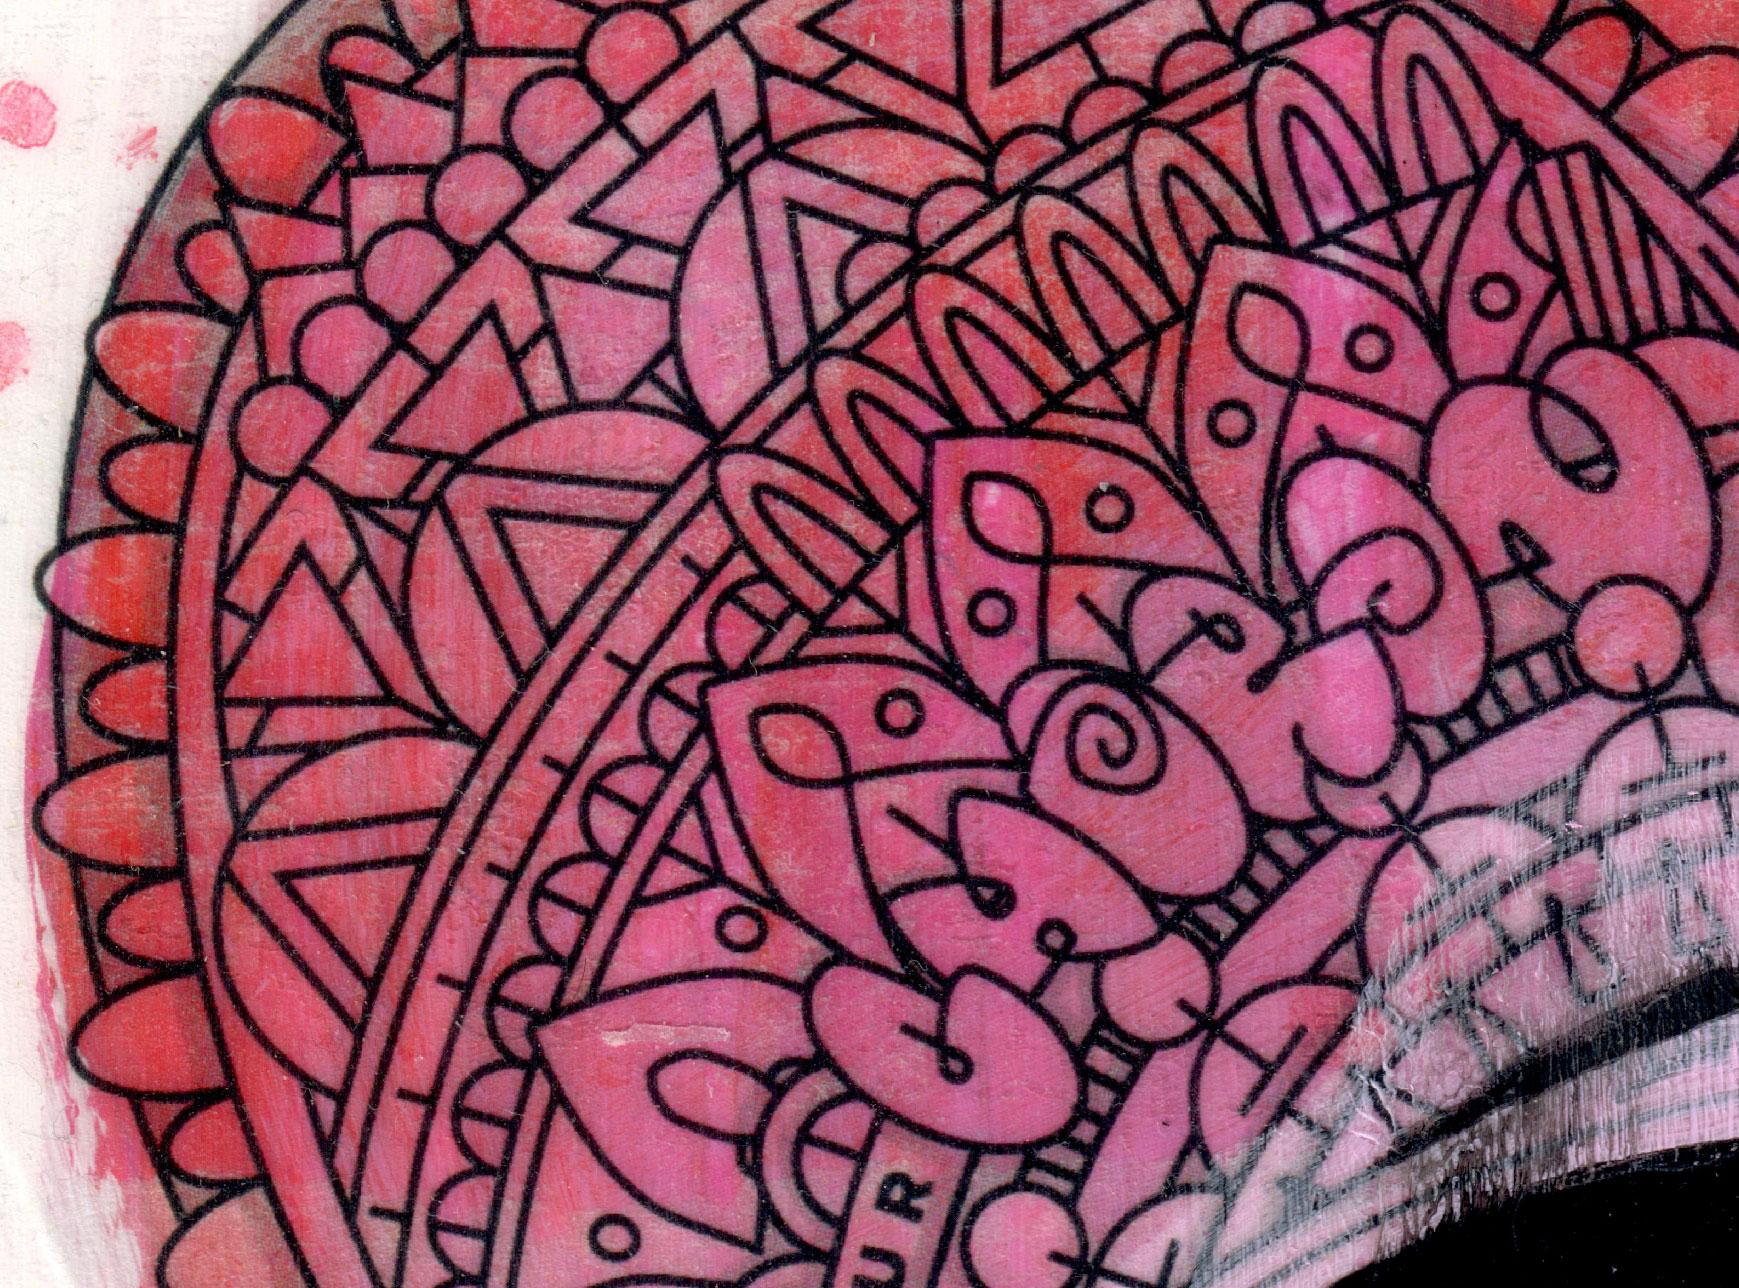 VisumEstBonum#2-Painting_Detail1.jpg